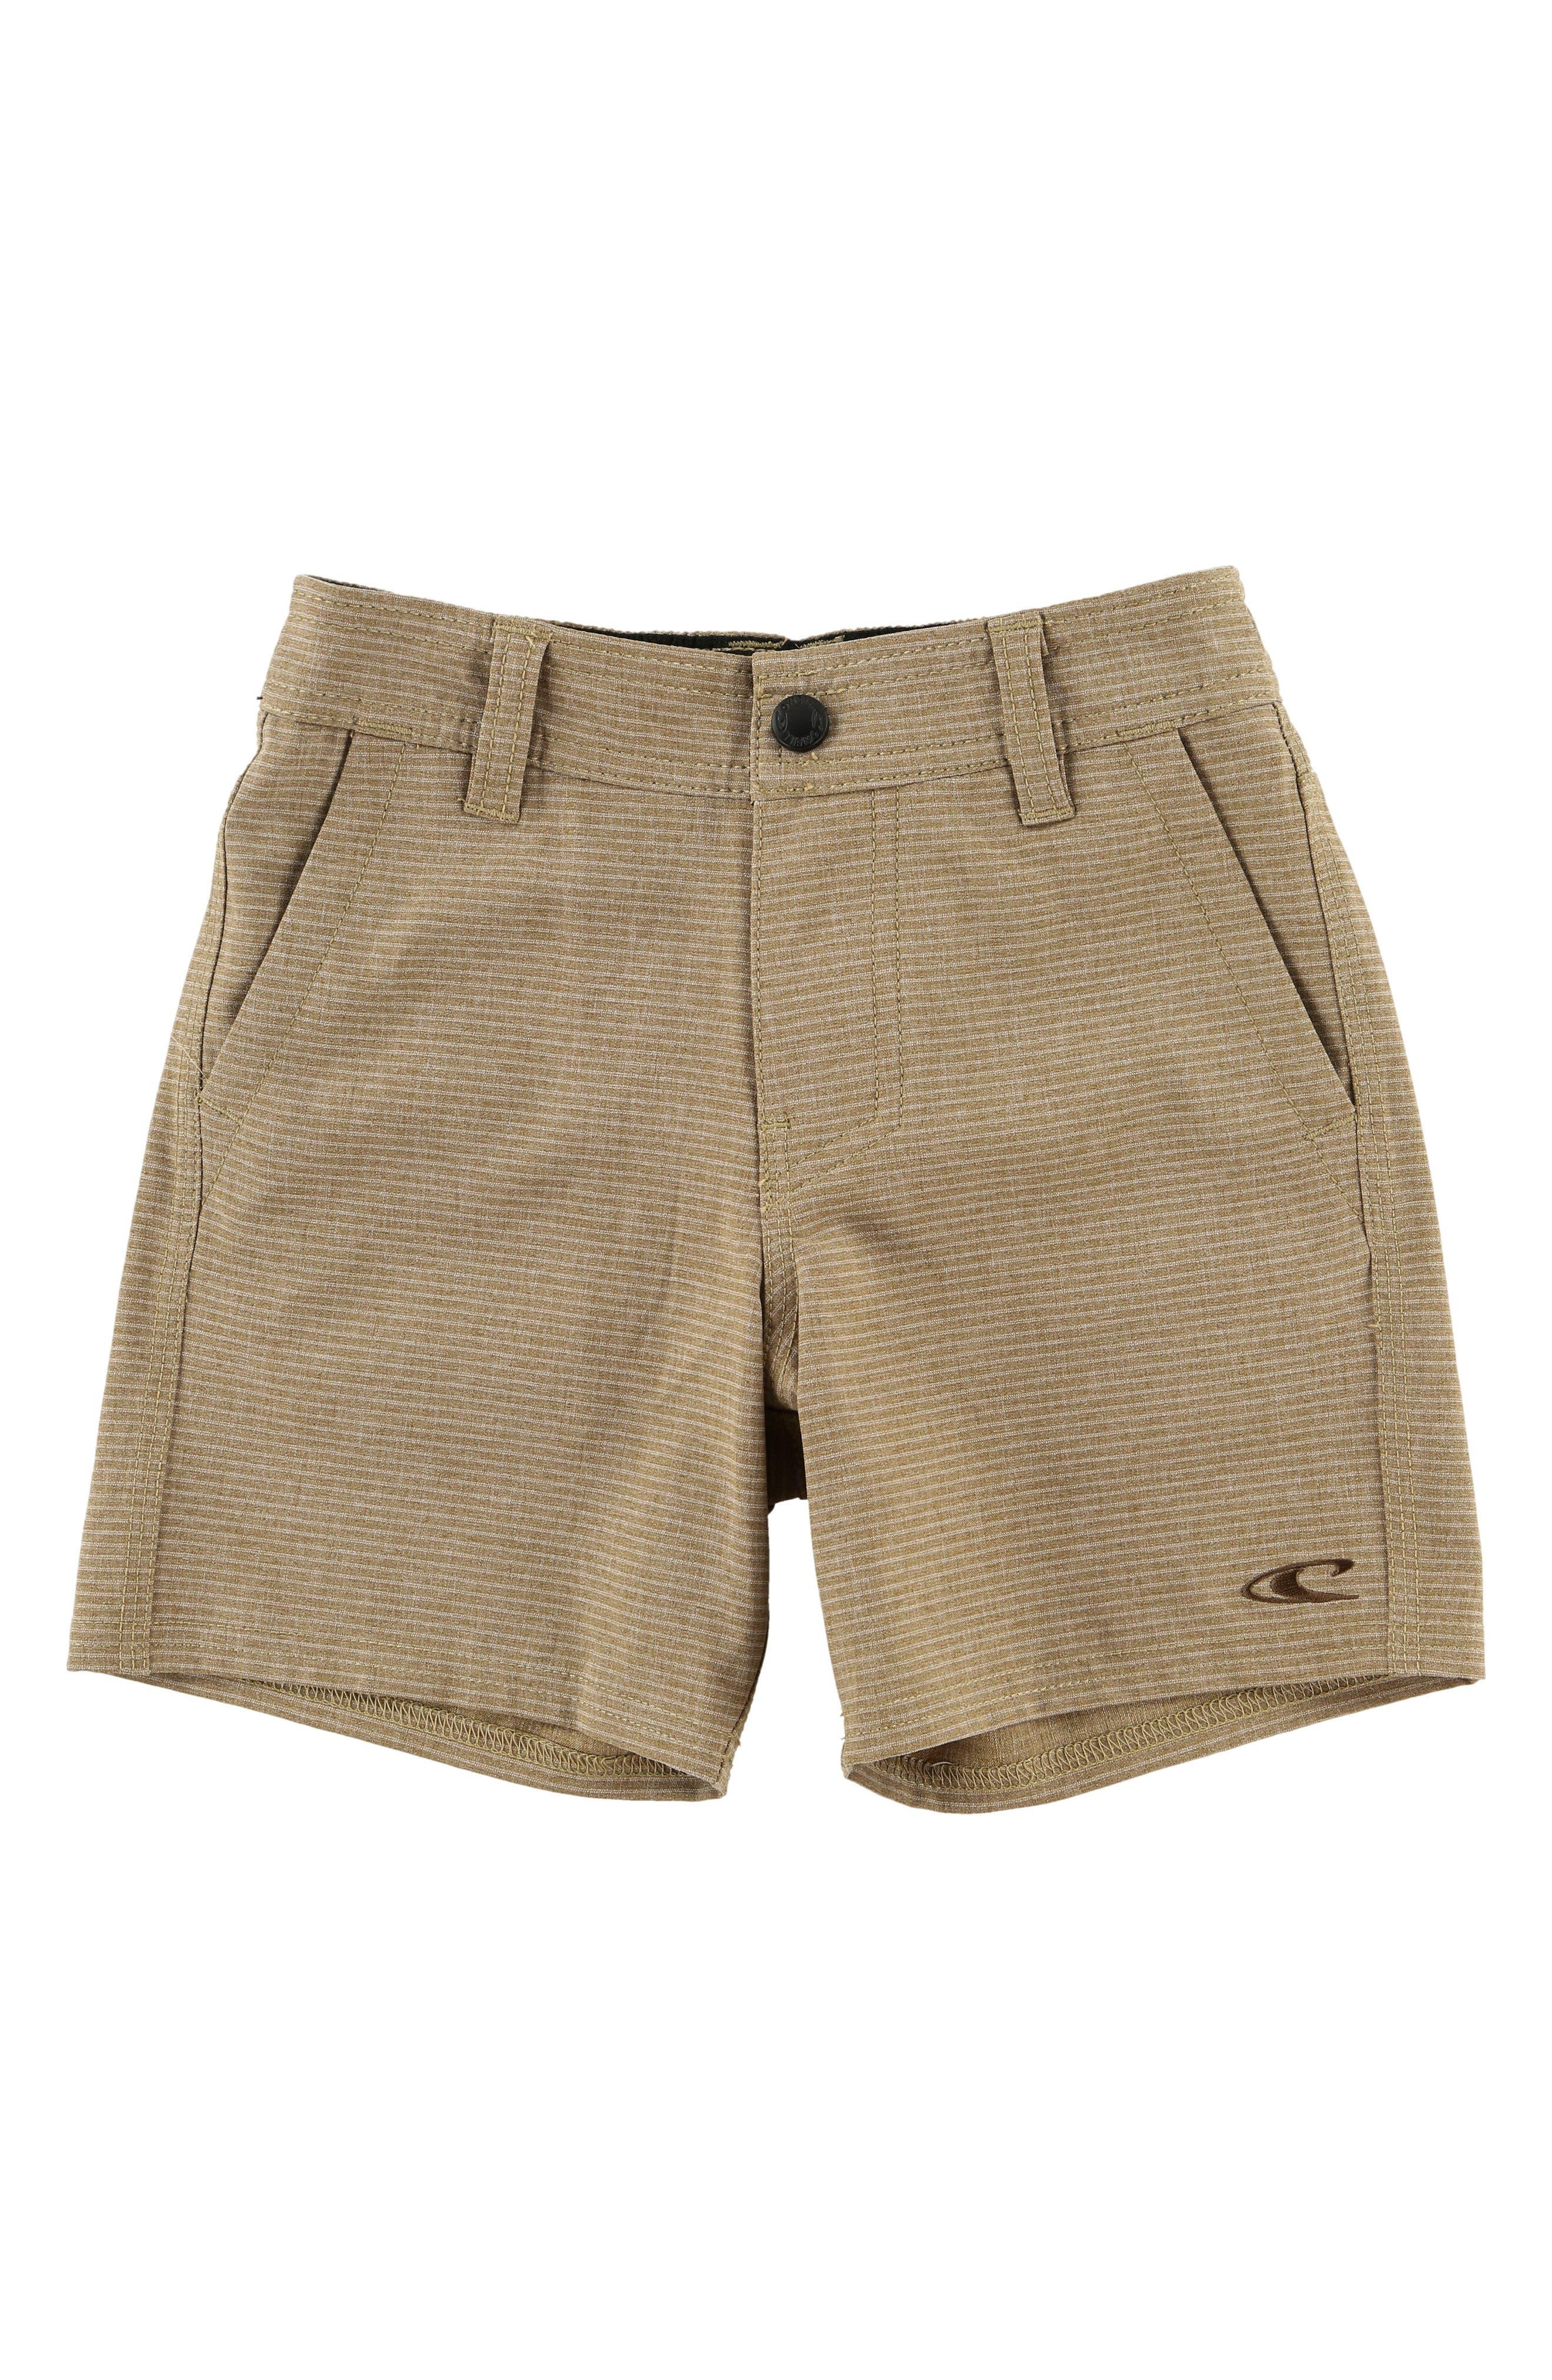 Locked Stripe Hybrid Shorts,                             Main thumbnail 1, color,                             205